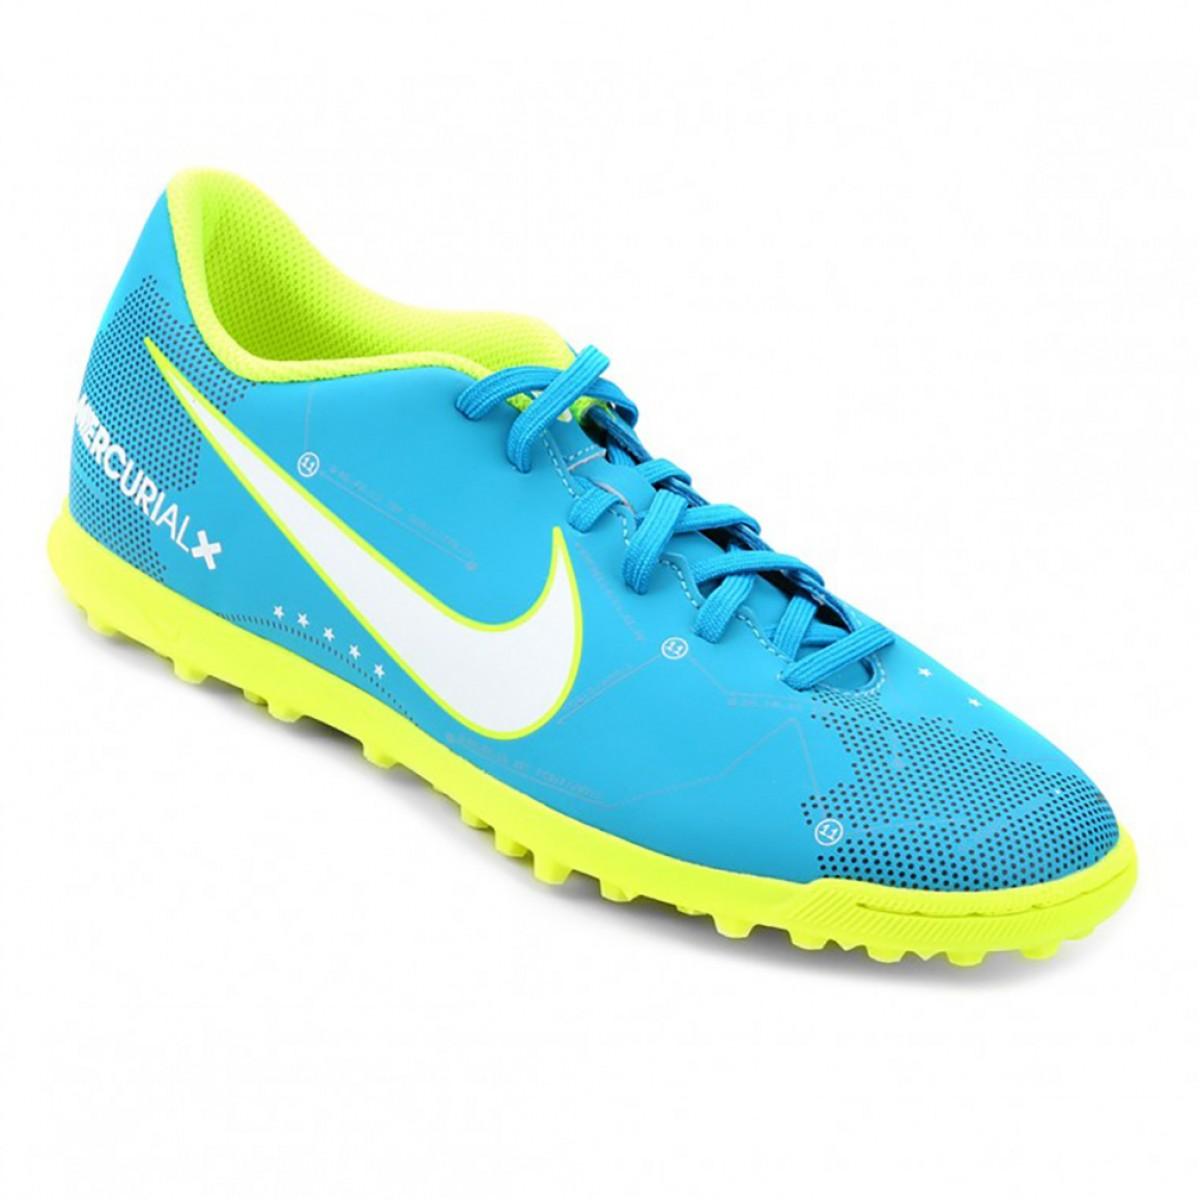 Chuteira Nike Mercural Vortex III Neymar Junior Azul - Compre Agora ... 8f200bfed3dea